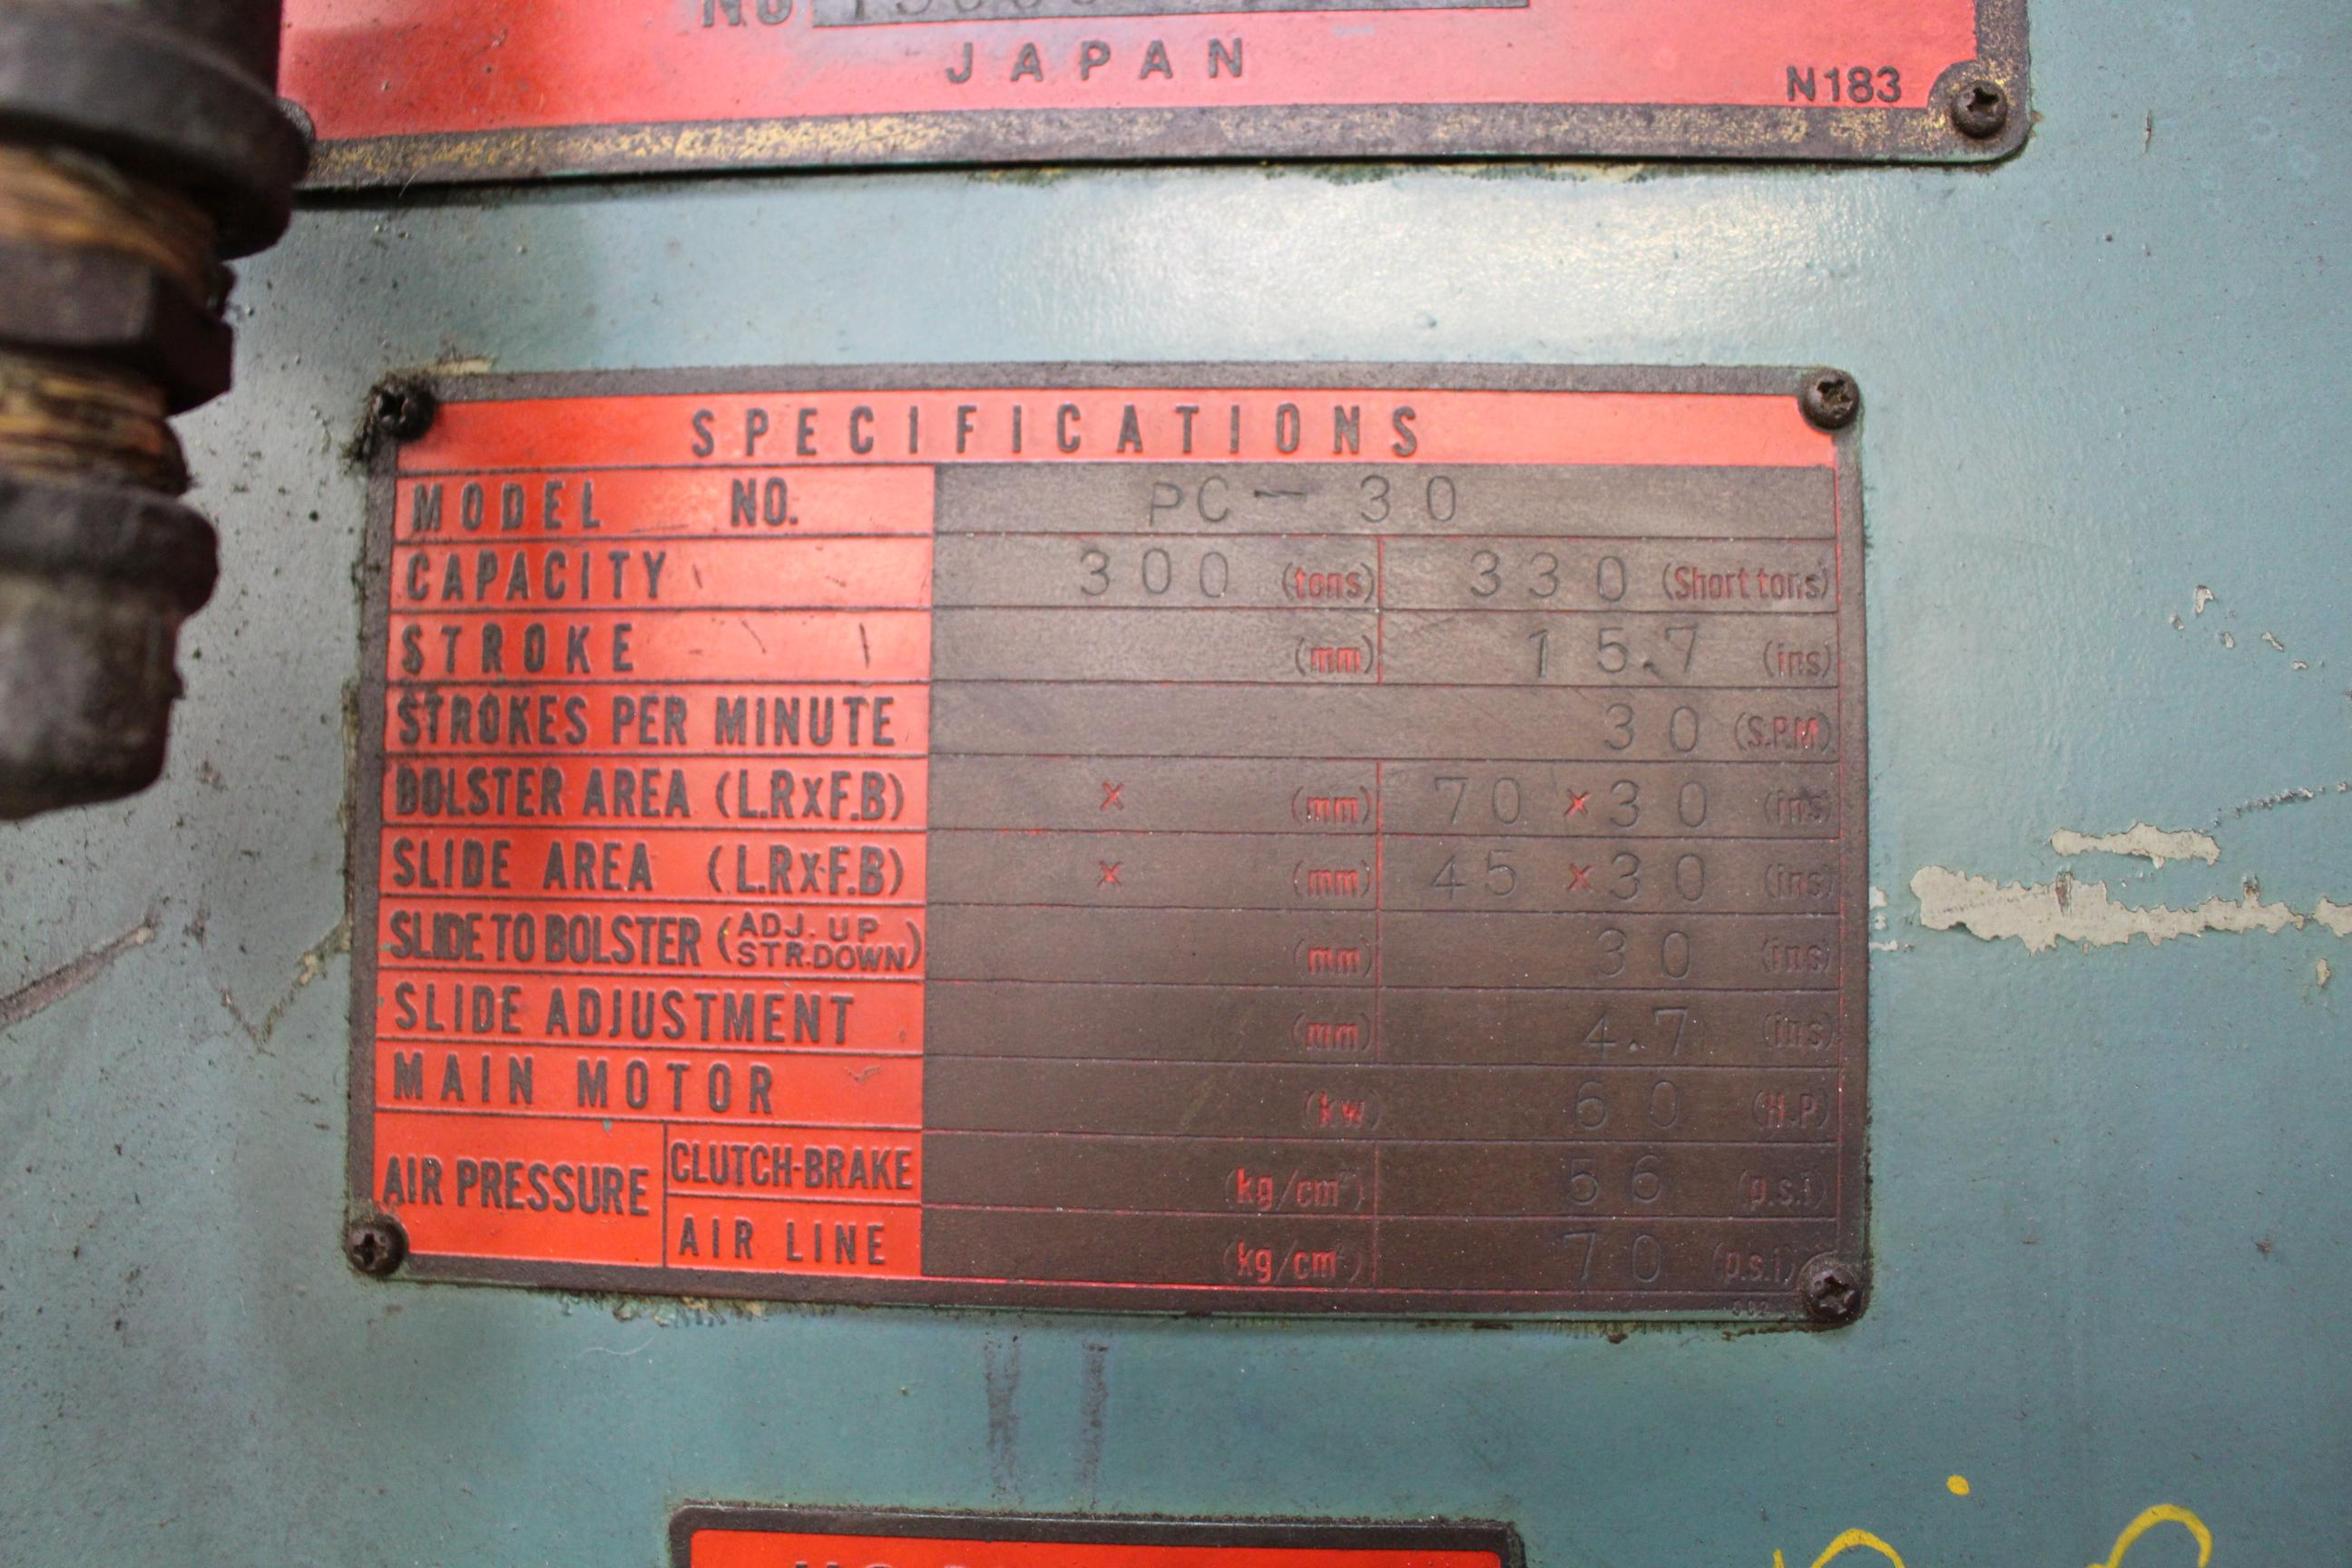 "AIDA MODEL PC-30 PUNCH PRESS, 300 TON CAPACITY,AIR CUSHION, 15.7"" STROKE, 30 SPM, 70"" X 30"" - Image 20 of 21"